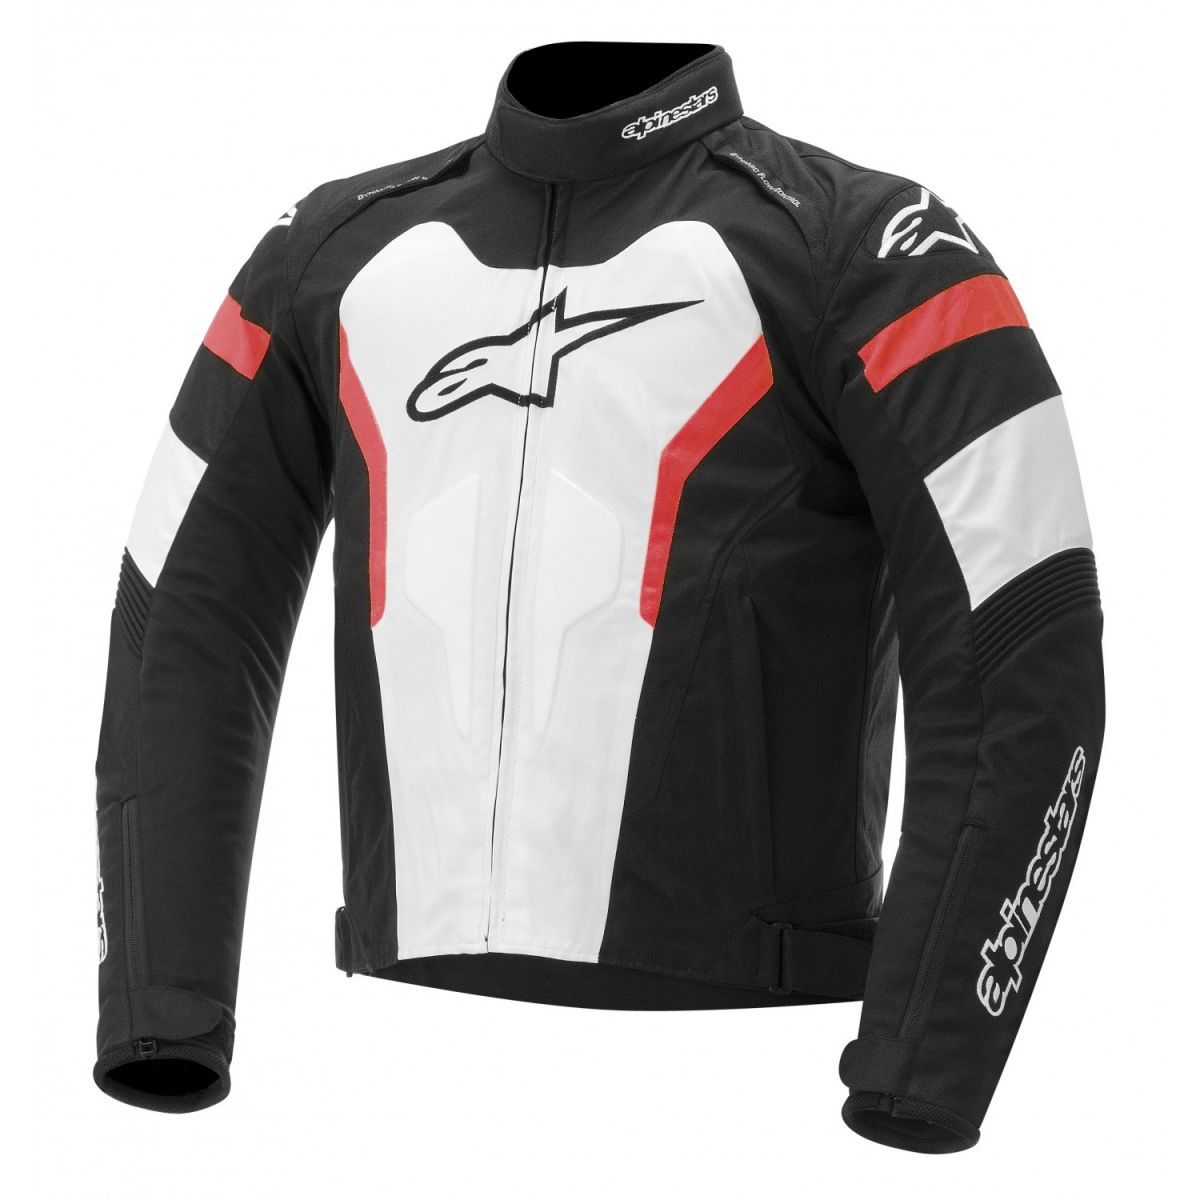 Jaqueta Alpinestars T GP Pro (Tricolor Vermelha)  - Super Bike - Loja Oficial Alpinestars